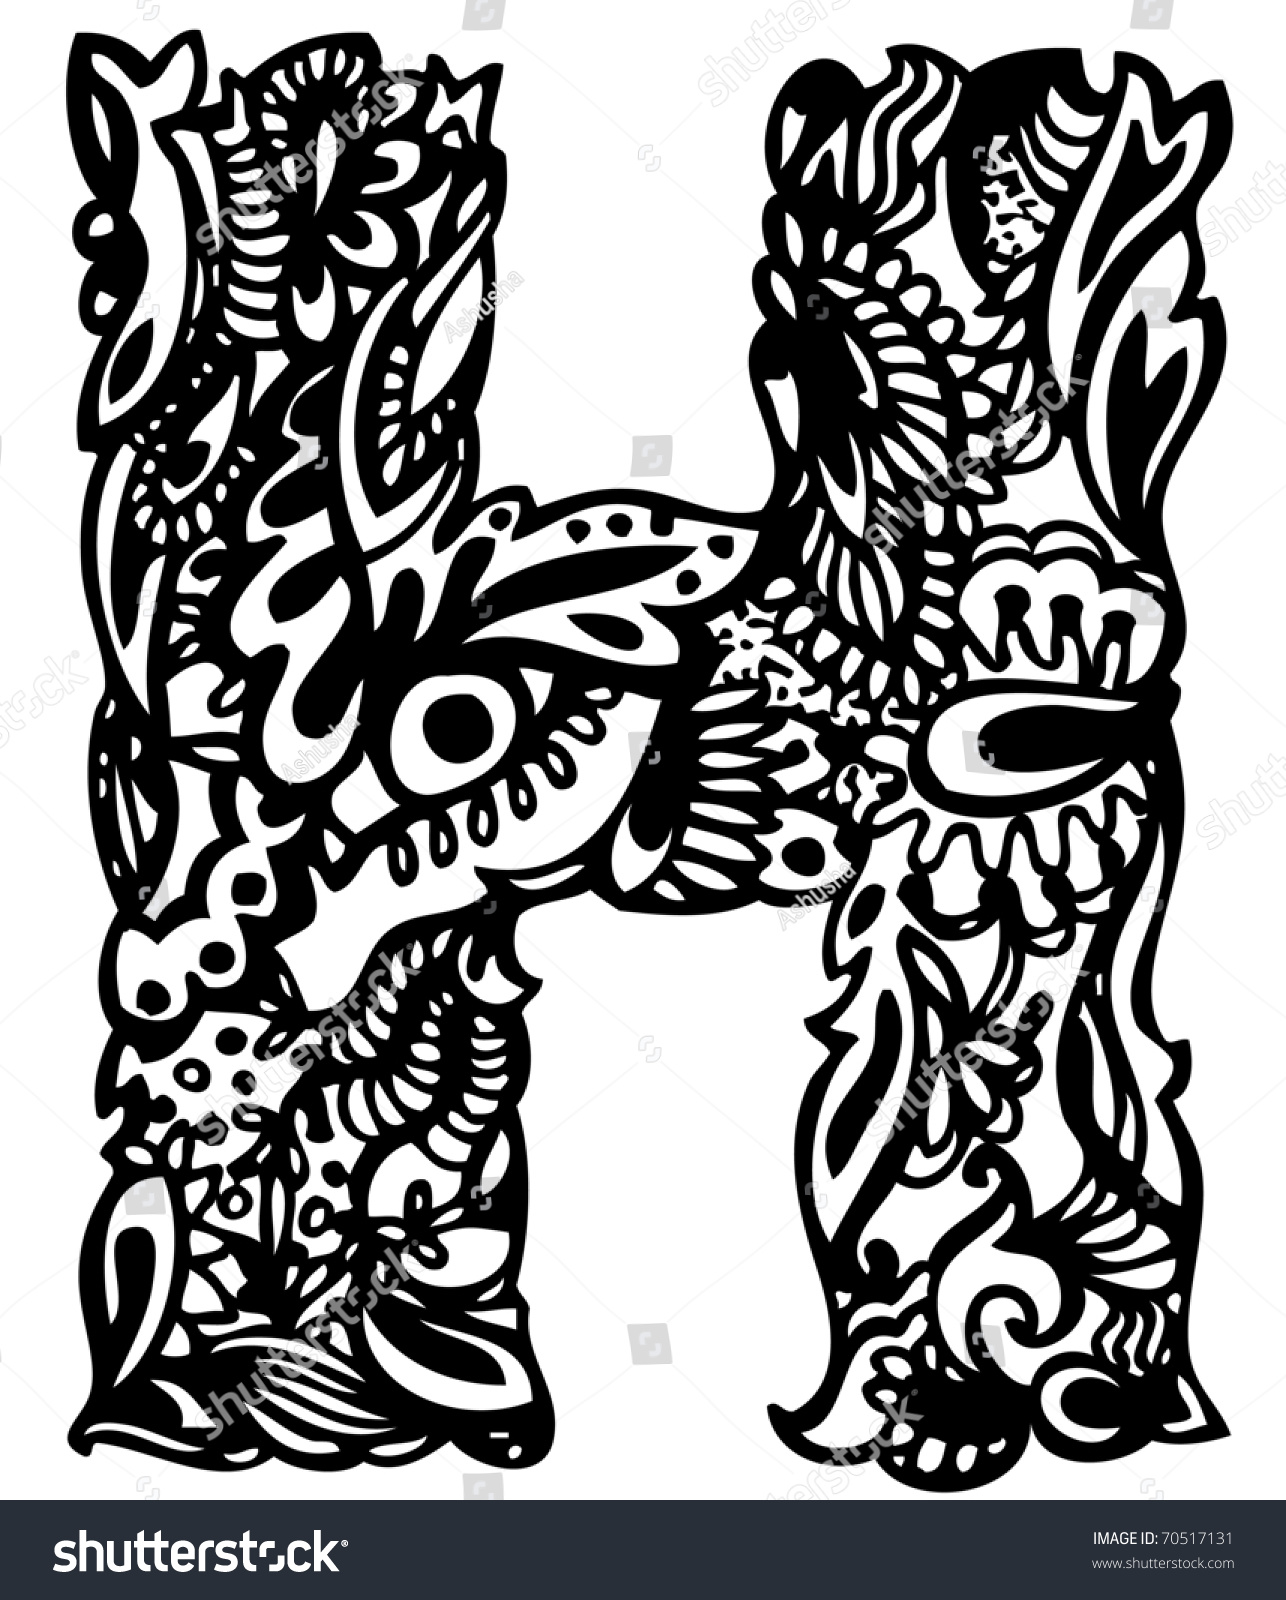 hand drawing letter h stock vector 70517131 shutterstock